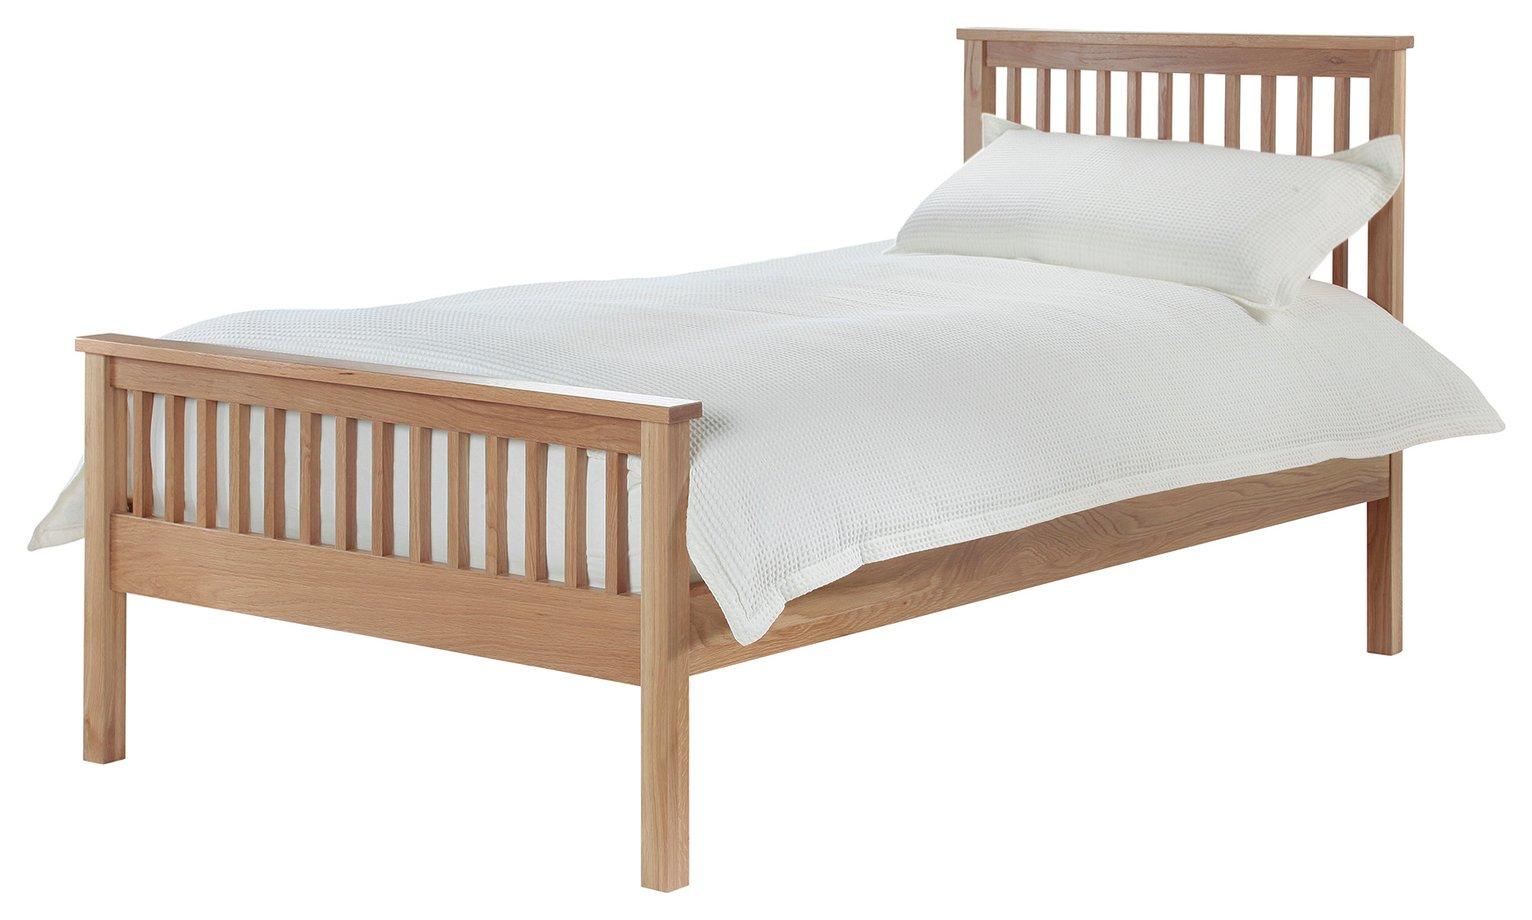 Silentnight Dakota Single Bed Frame - Natural